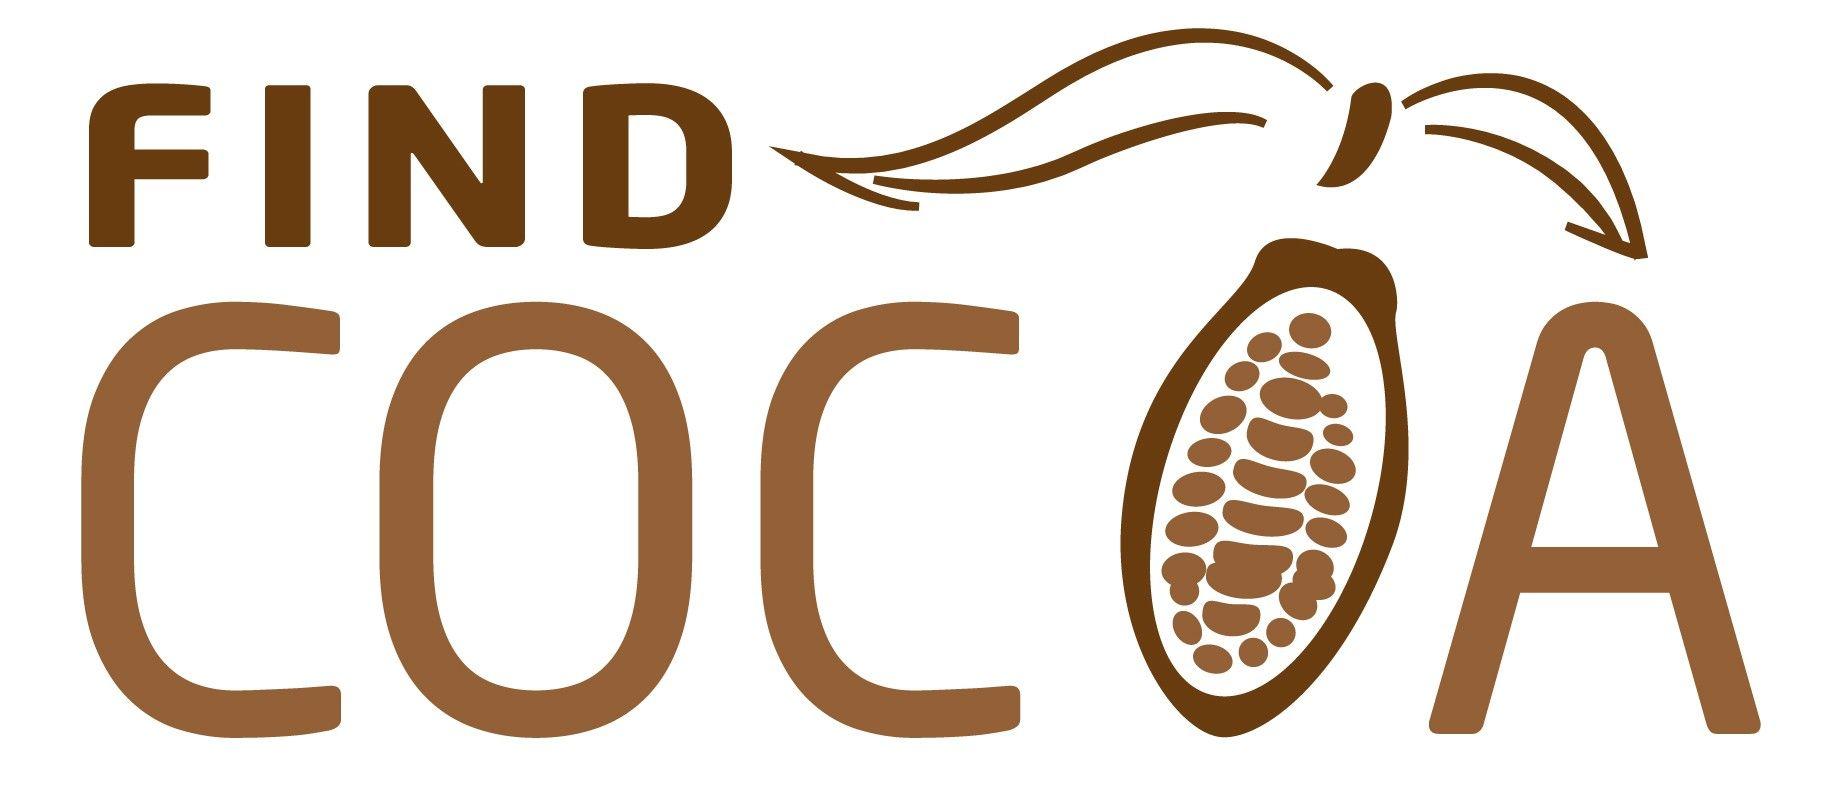 FindCocoa Logo